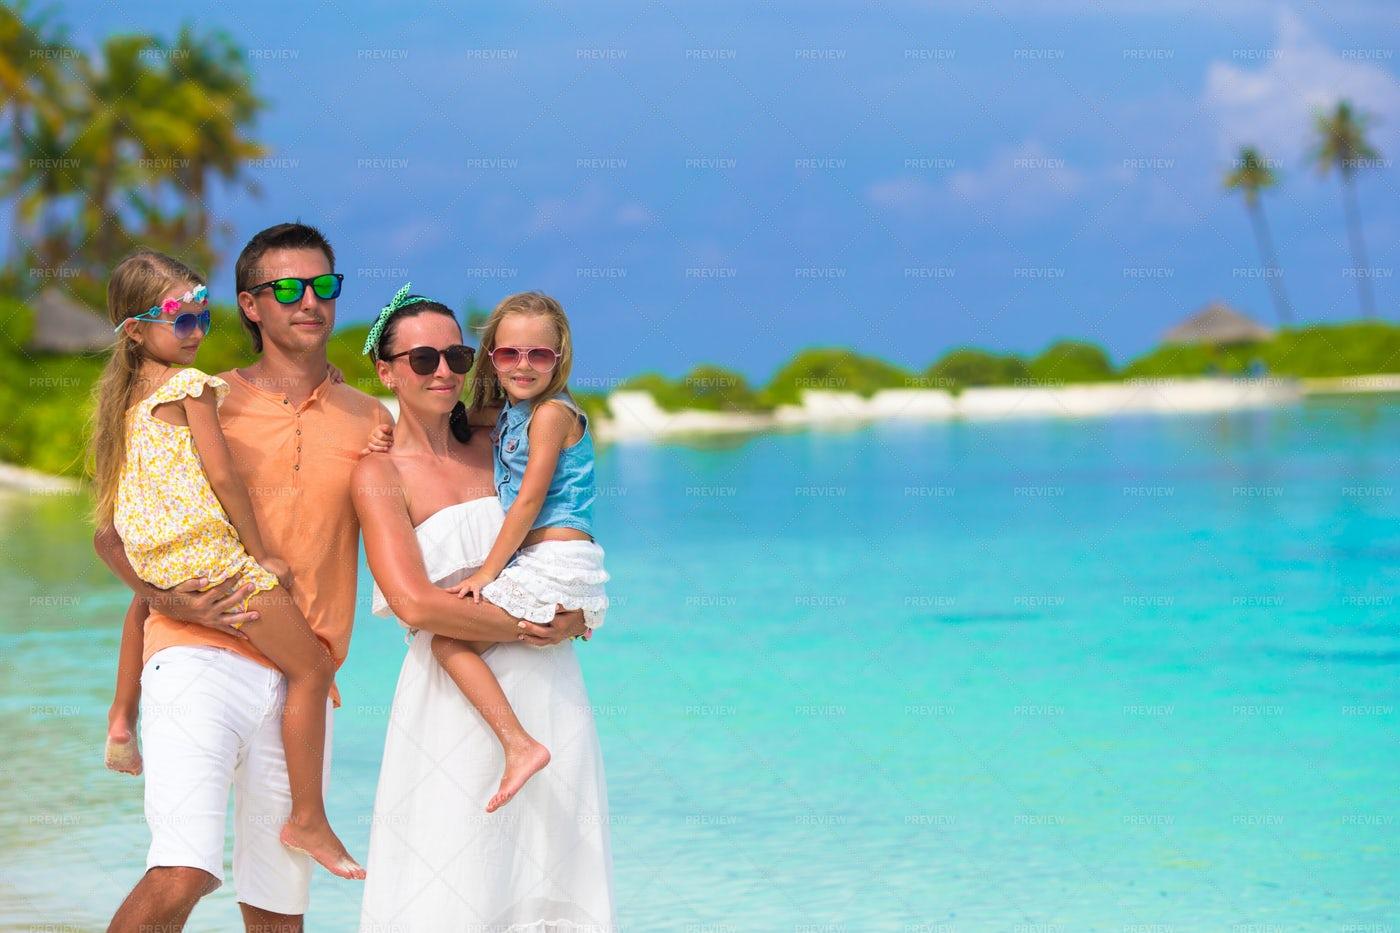 Family Of Four On Beach Vacation: Stock Photos